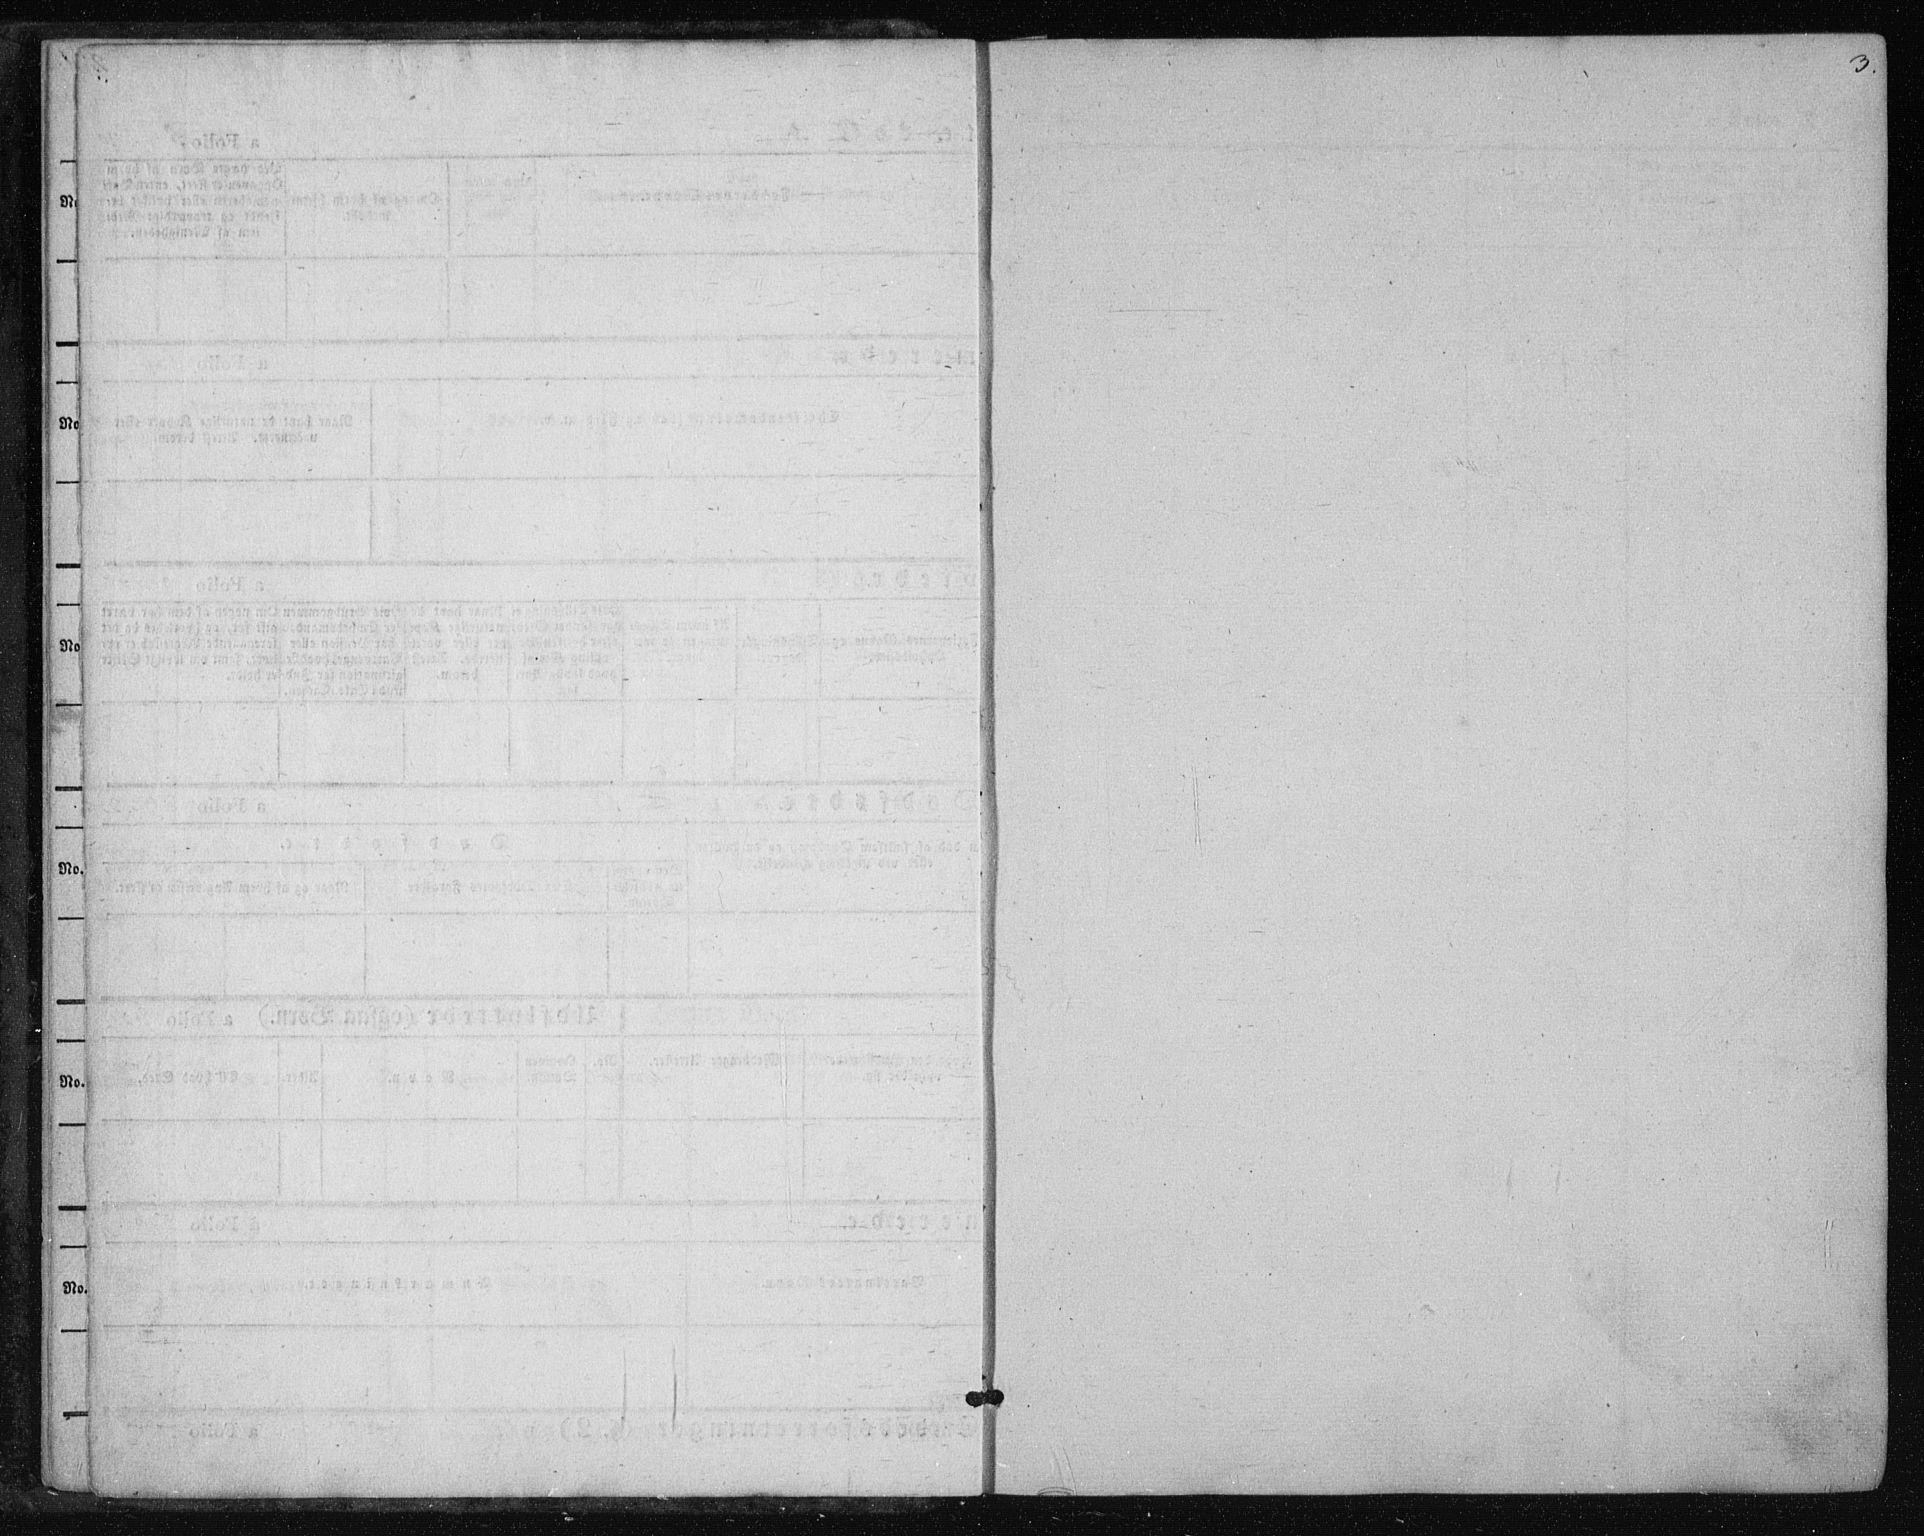 SAKO, Tinn kirkebøker, F/Fa/L0005: Ministerialbok nr. I 5, 1844-1856, s. 3